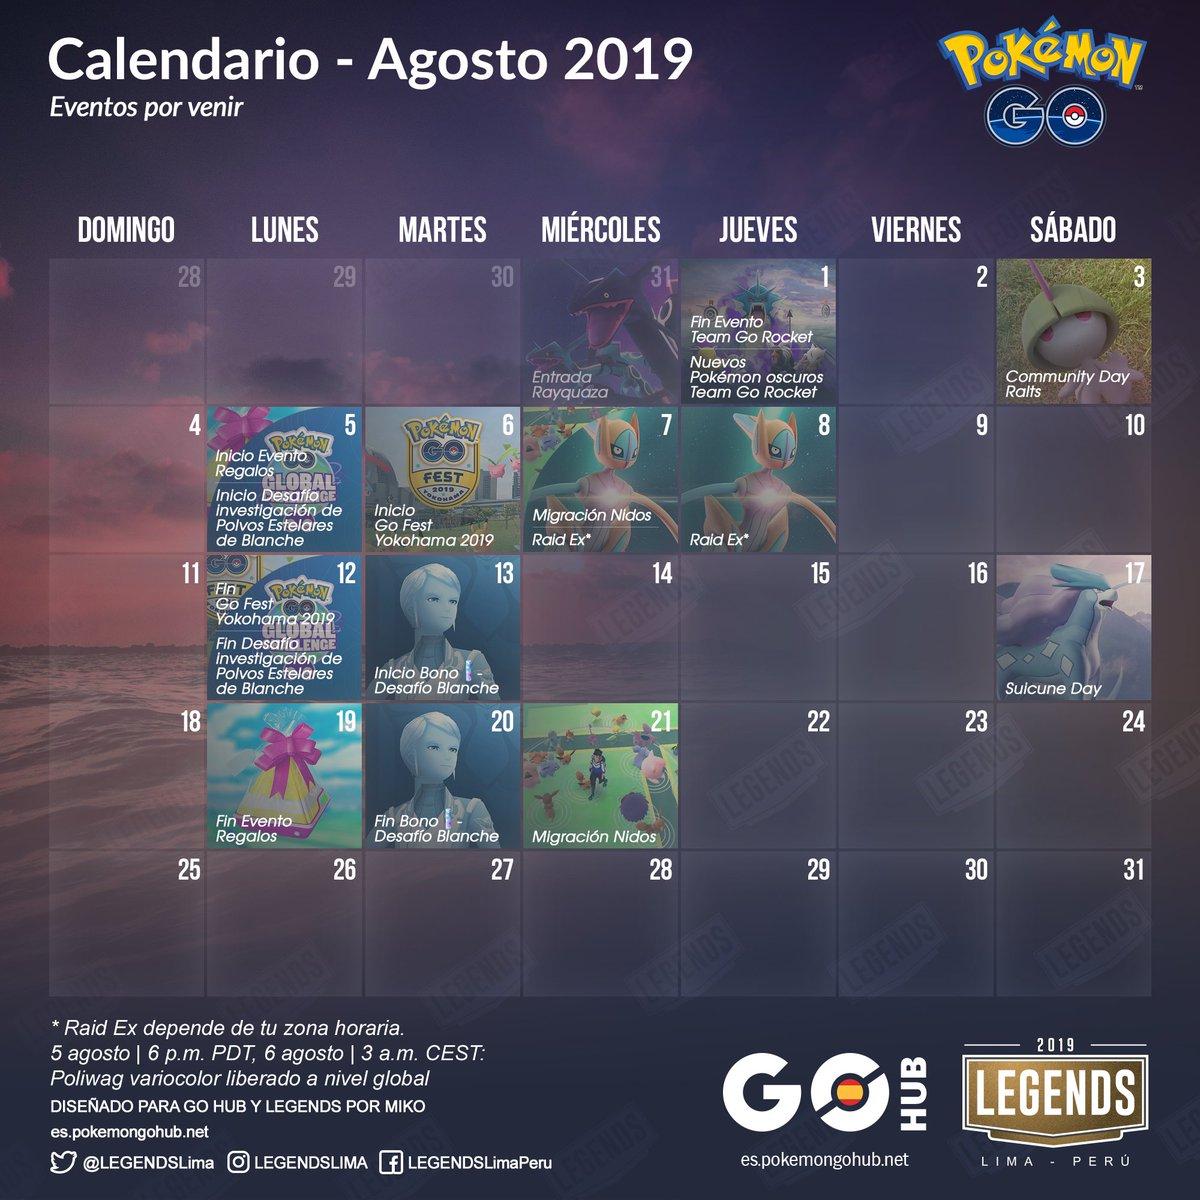 Calendario Agosto 2019 Espana.Pokemon Go Hub Espana On Twitter Calendario Agosto 2019 Aqui Os